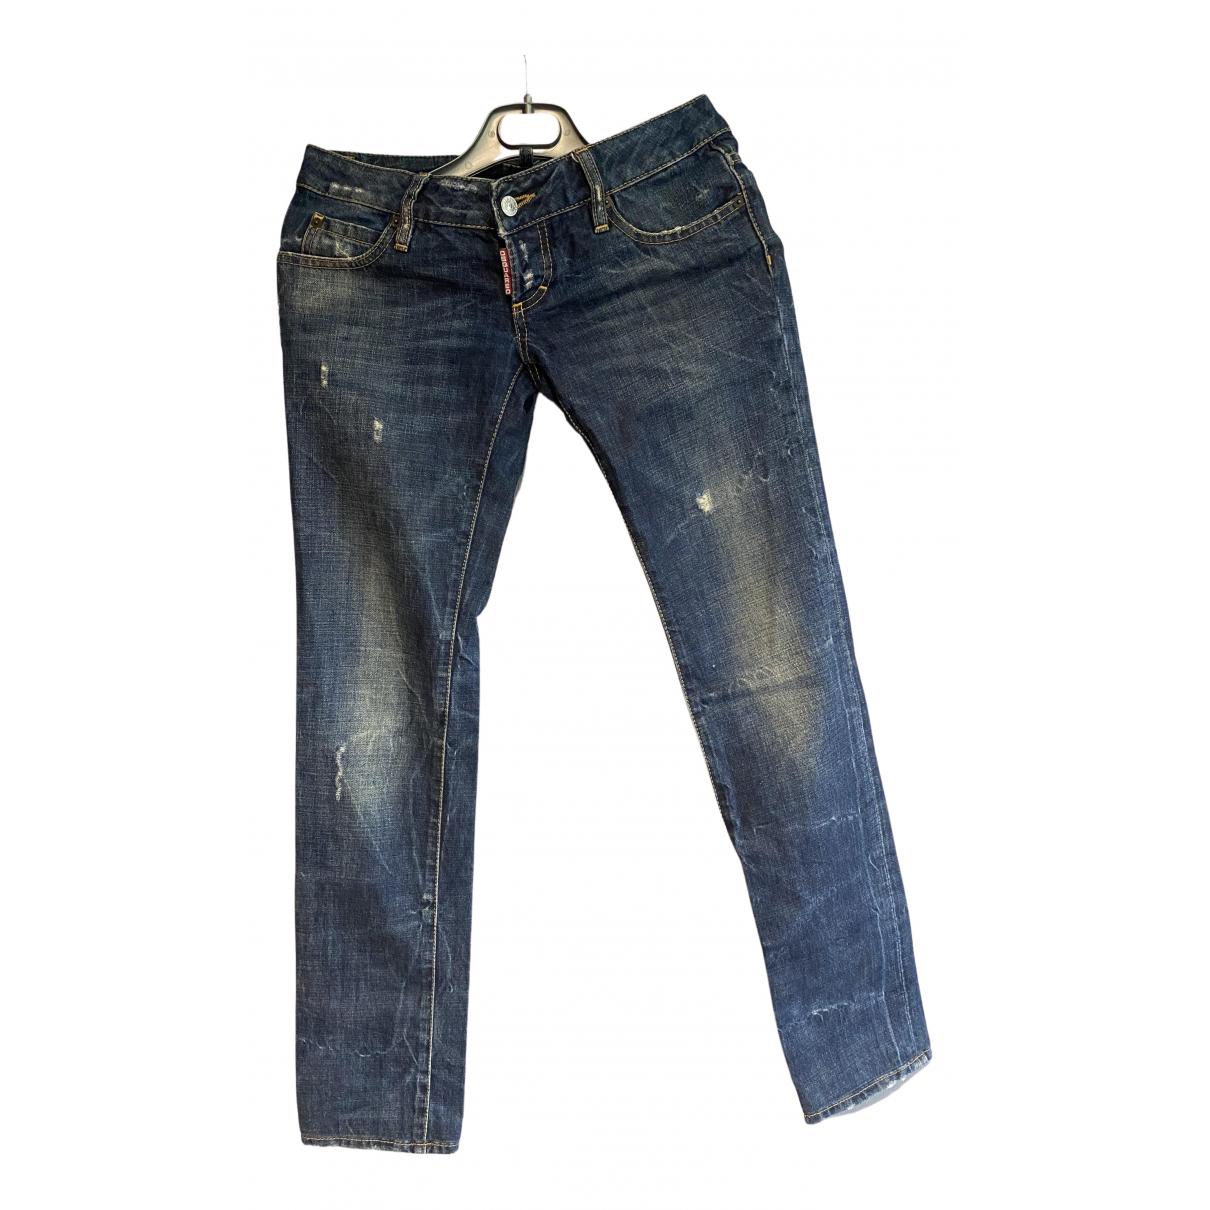 Dsquared2 N Blue Denim - Jeans Jeans for Women 36 FR